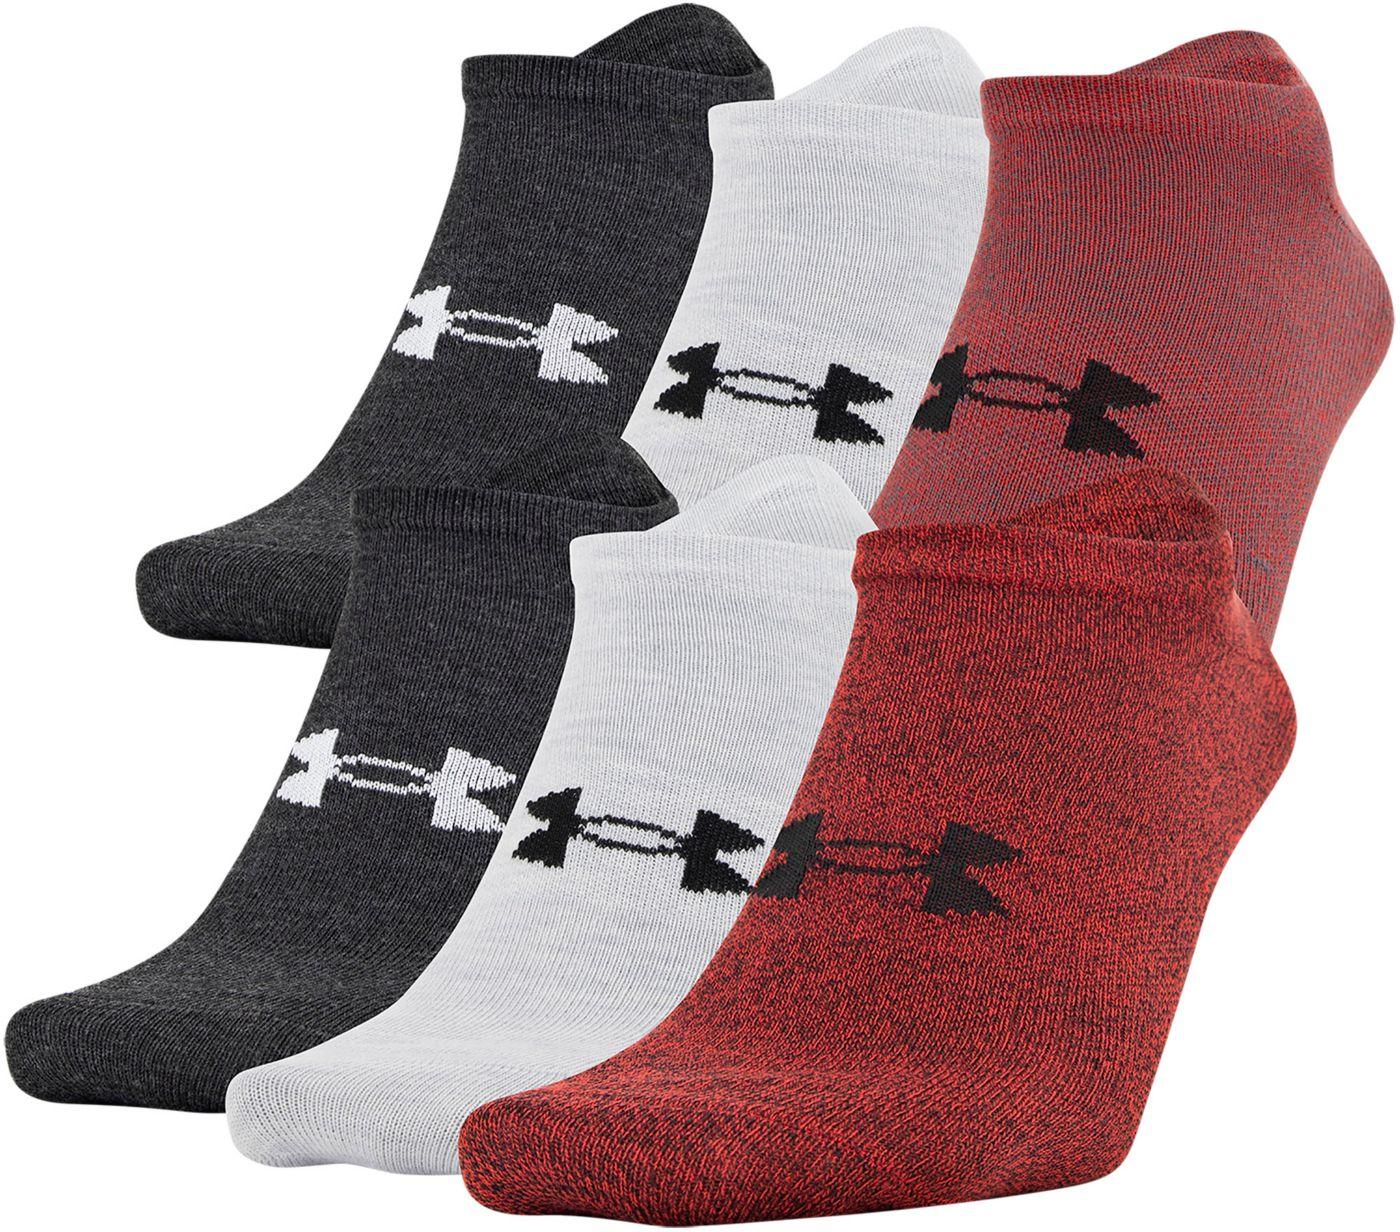 Under Armour Men's Essential Lite No Show Socks - 6 Pack